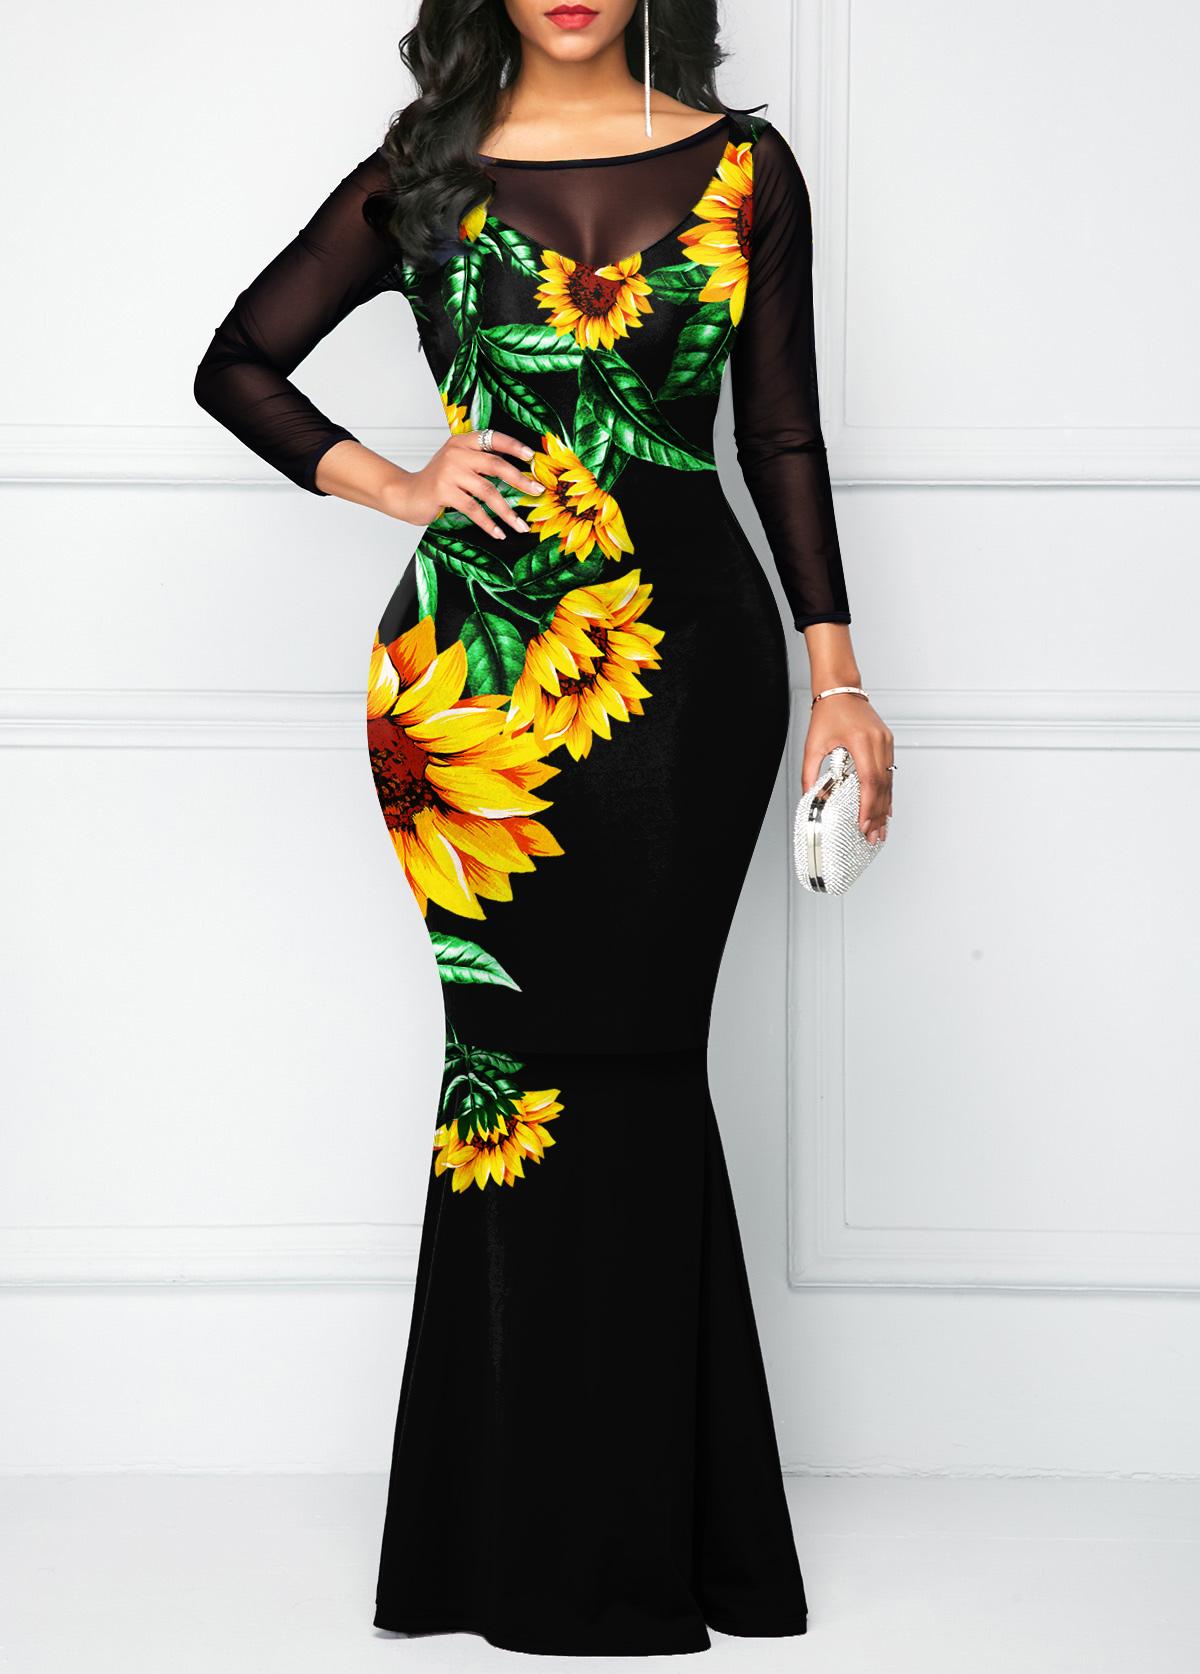 ROTITA Sunflower Print Mesh Stitching Bowknot Dress